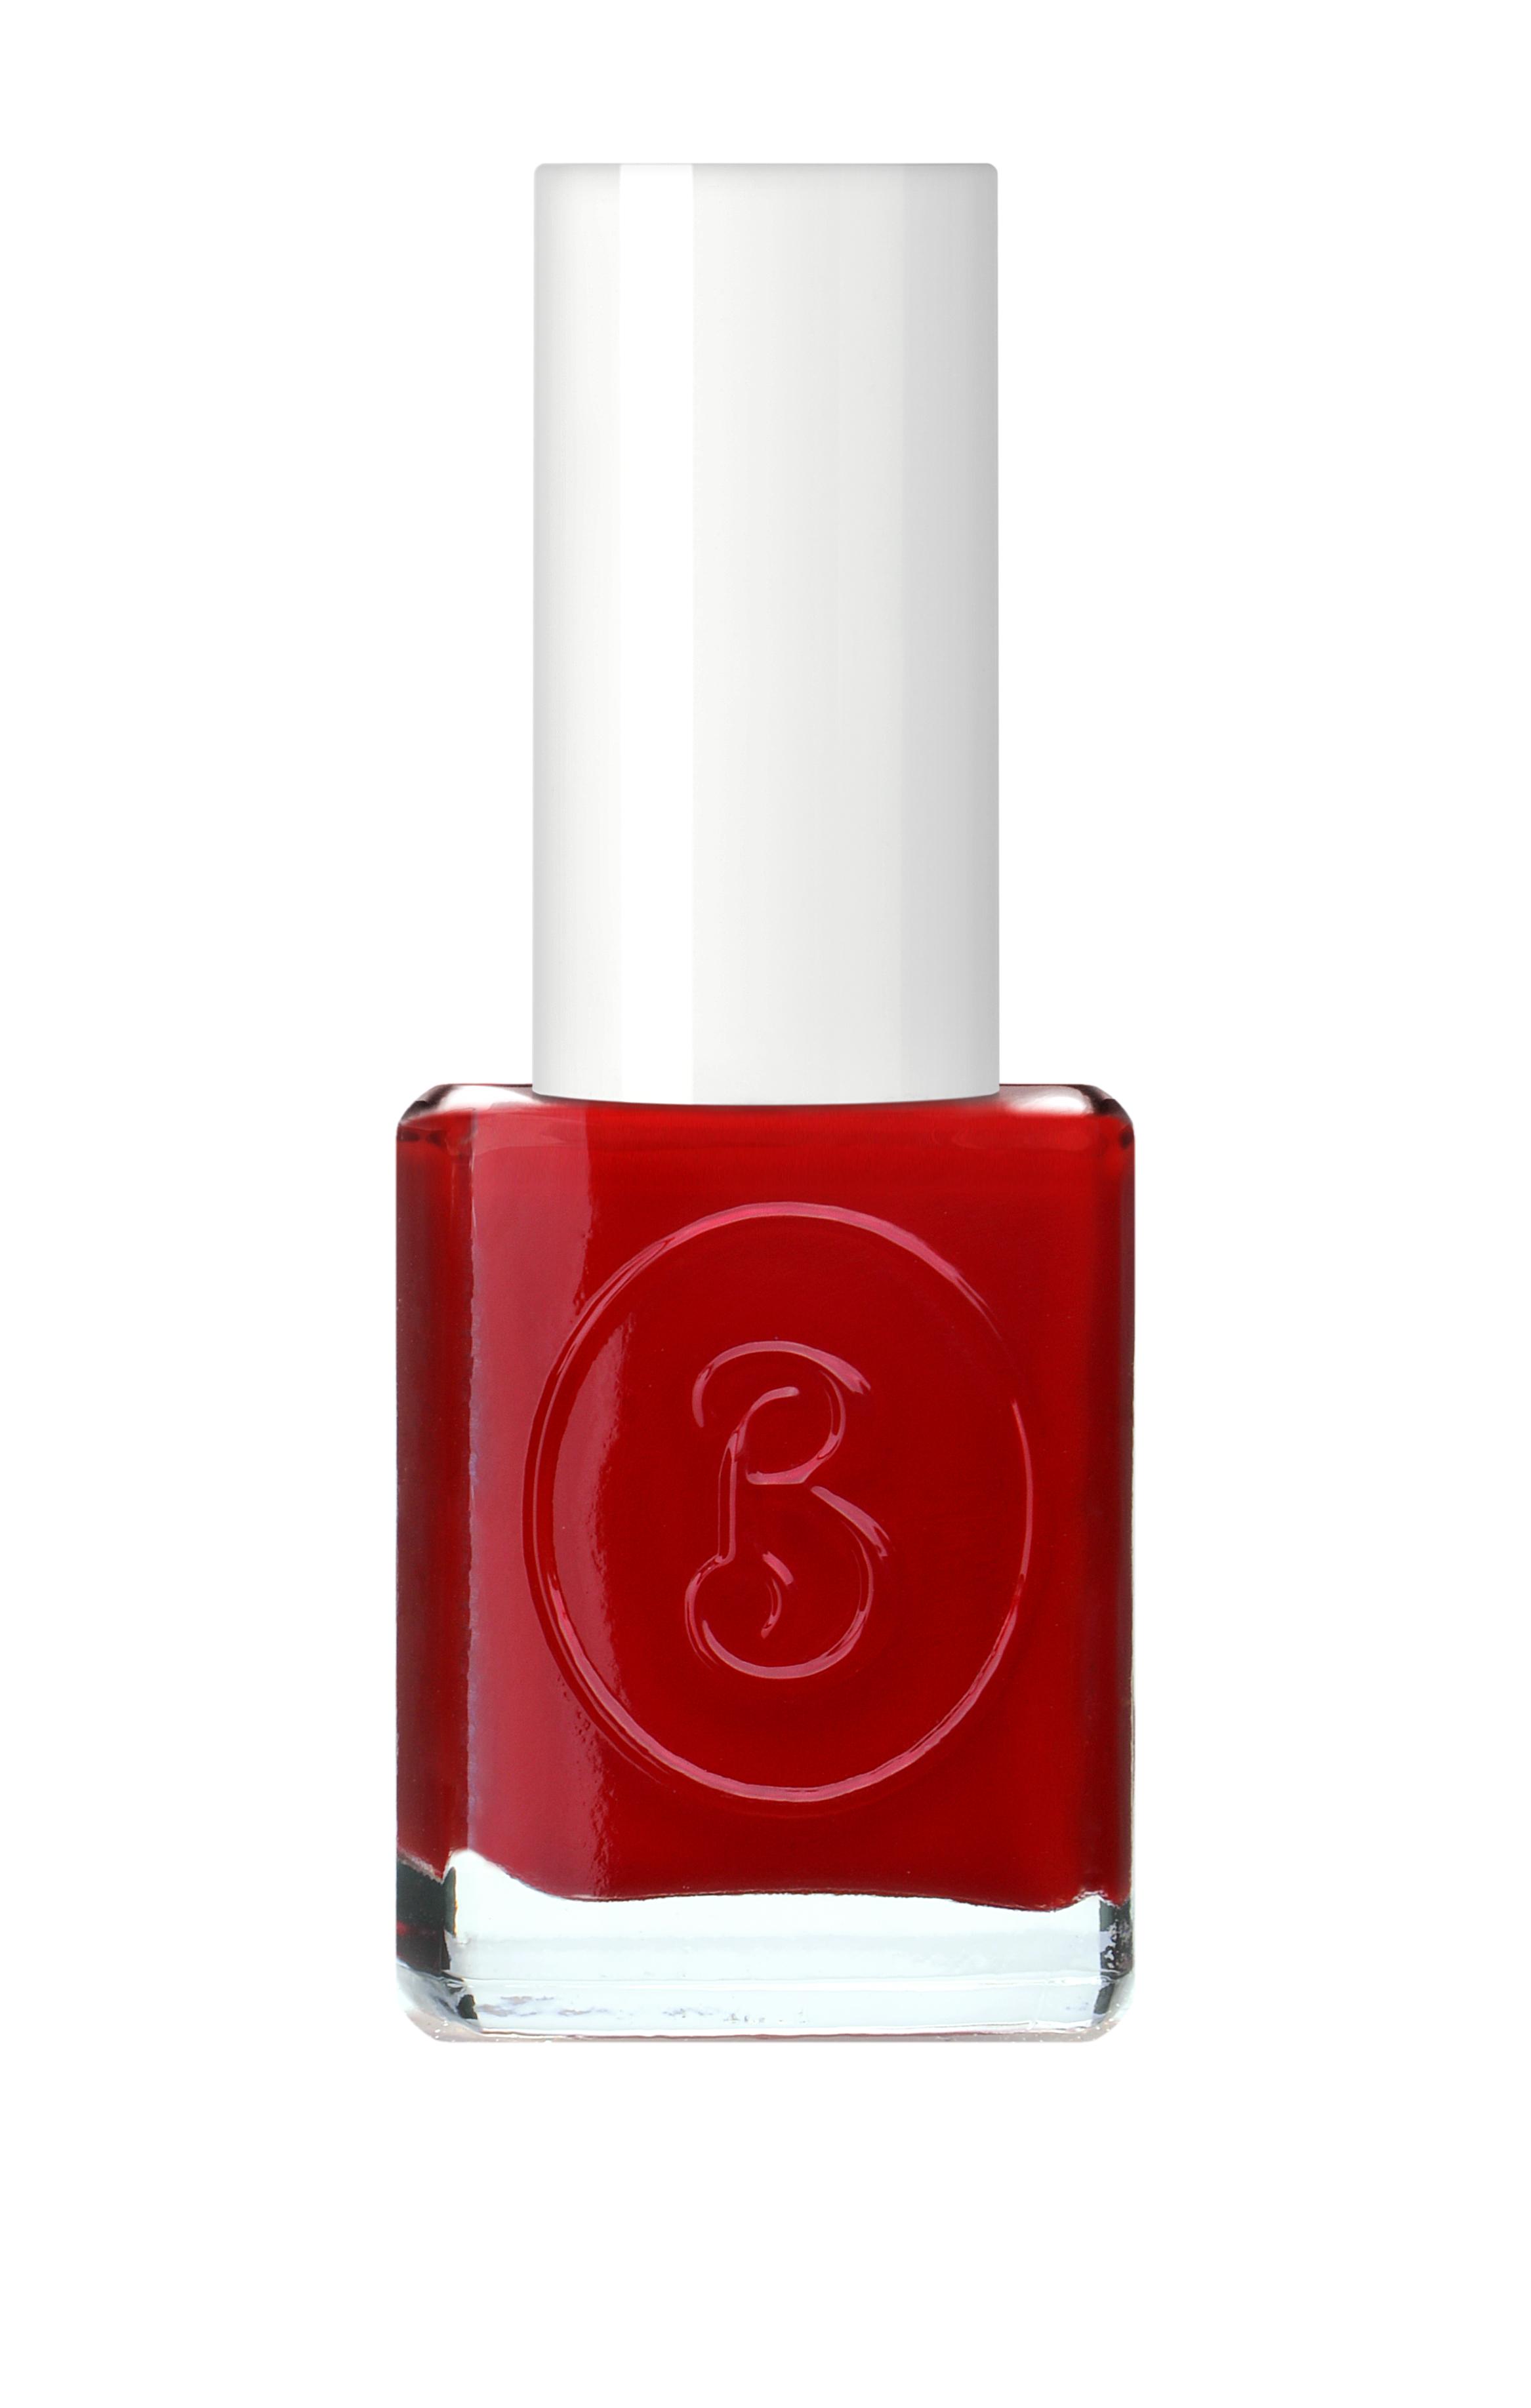 BERENICE 11 лак для ногтей, кораллово-красный / Coral red 16 мл berenice 53 лак для ногтей рыжая лиса red fox 16 мл